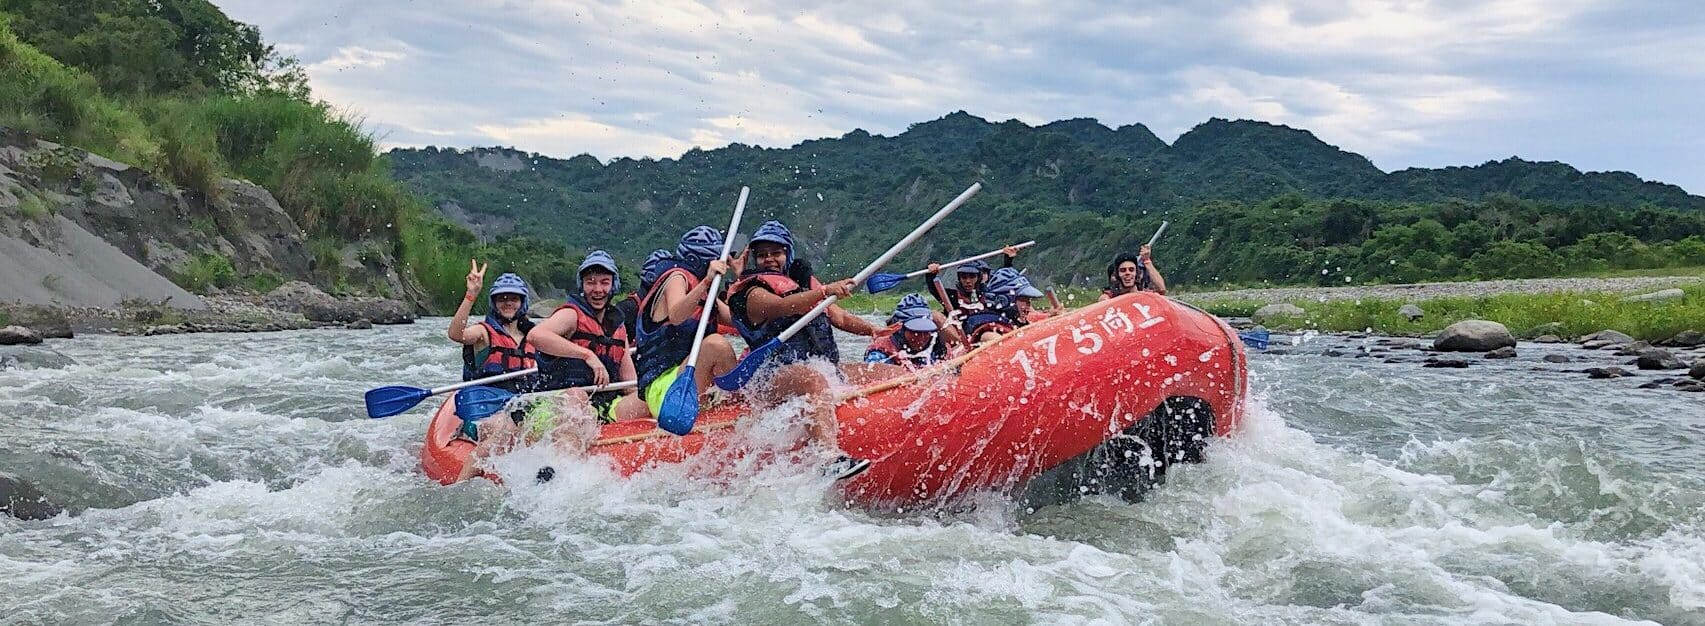 Xiuguluan River Rafting